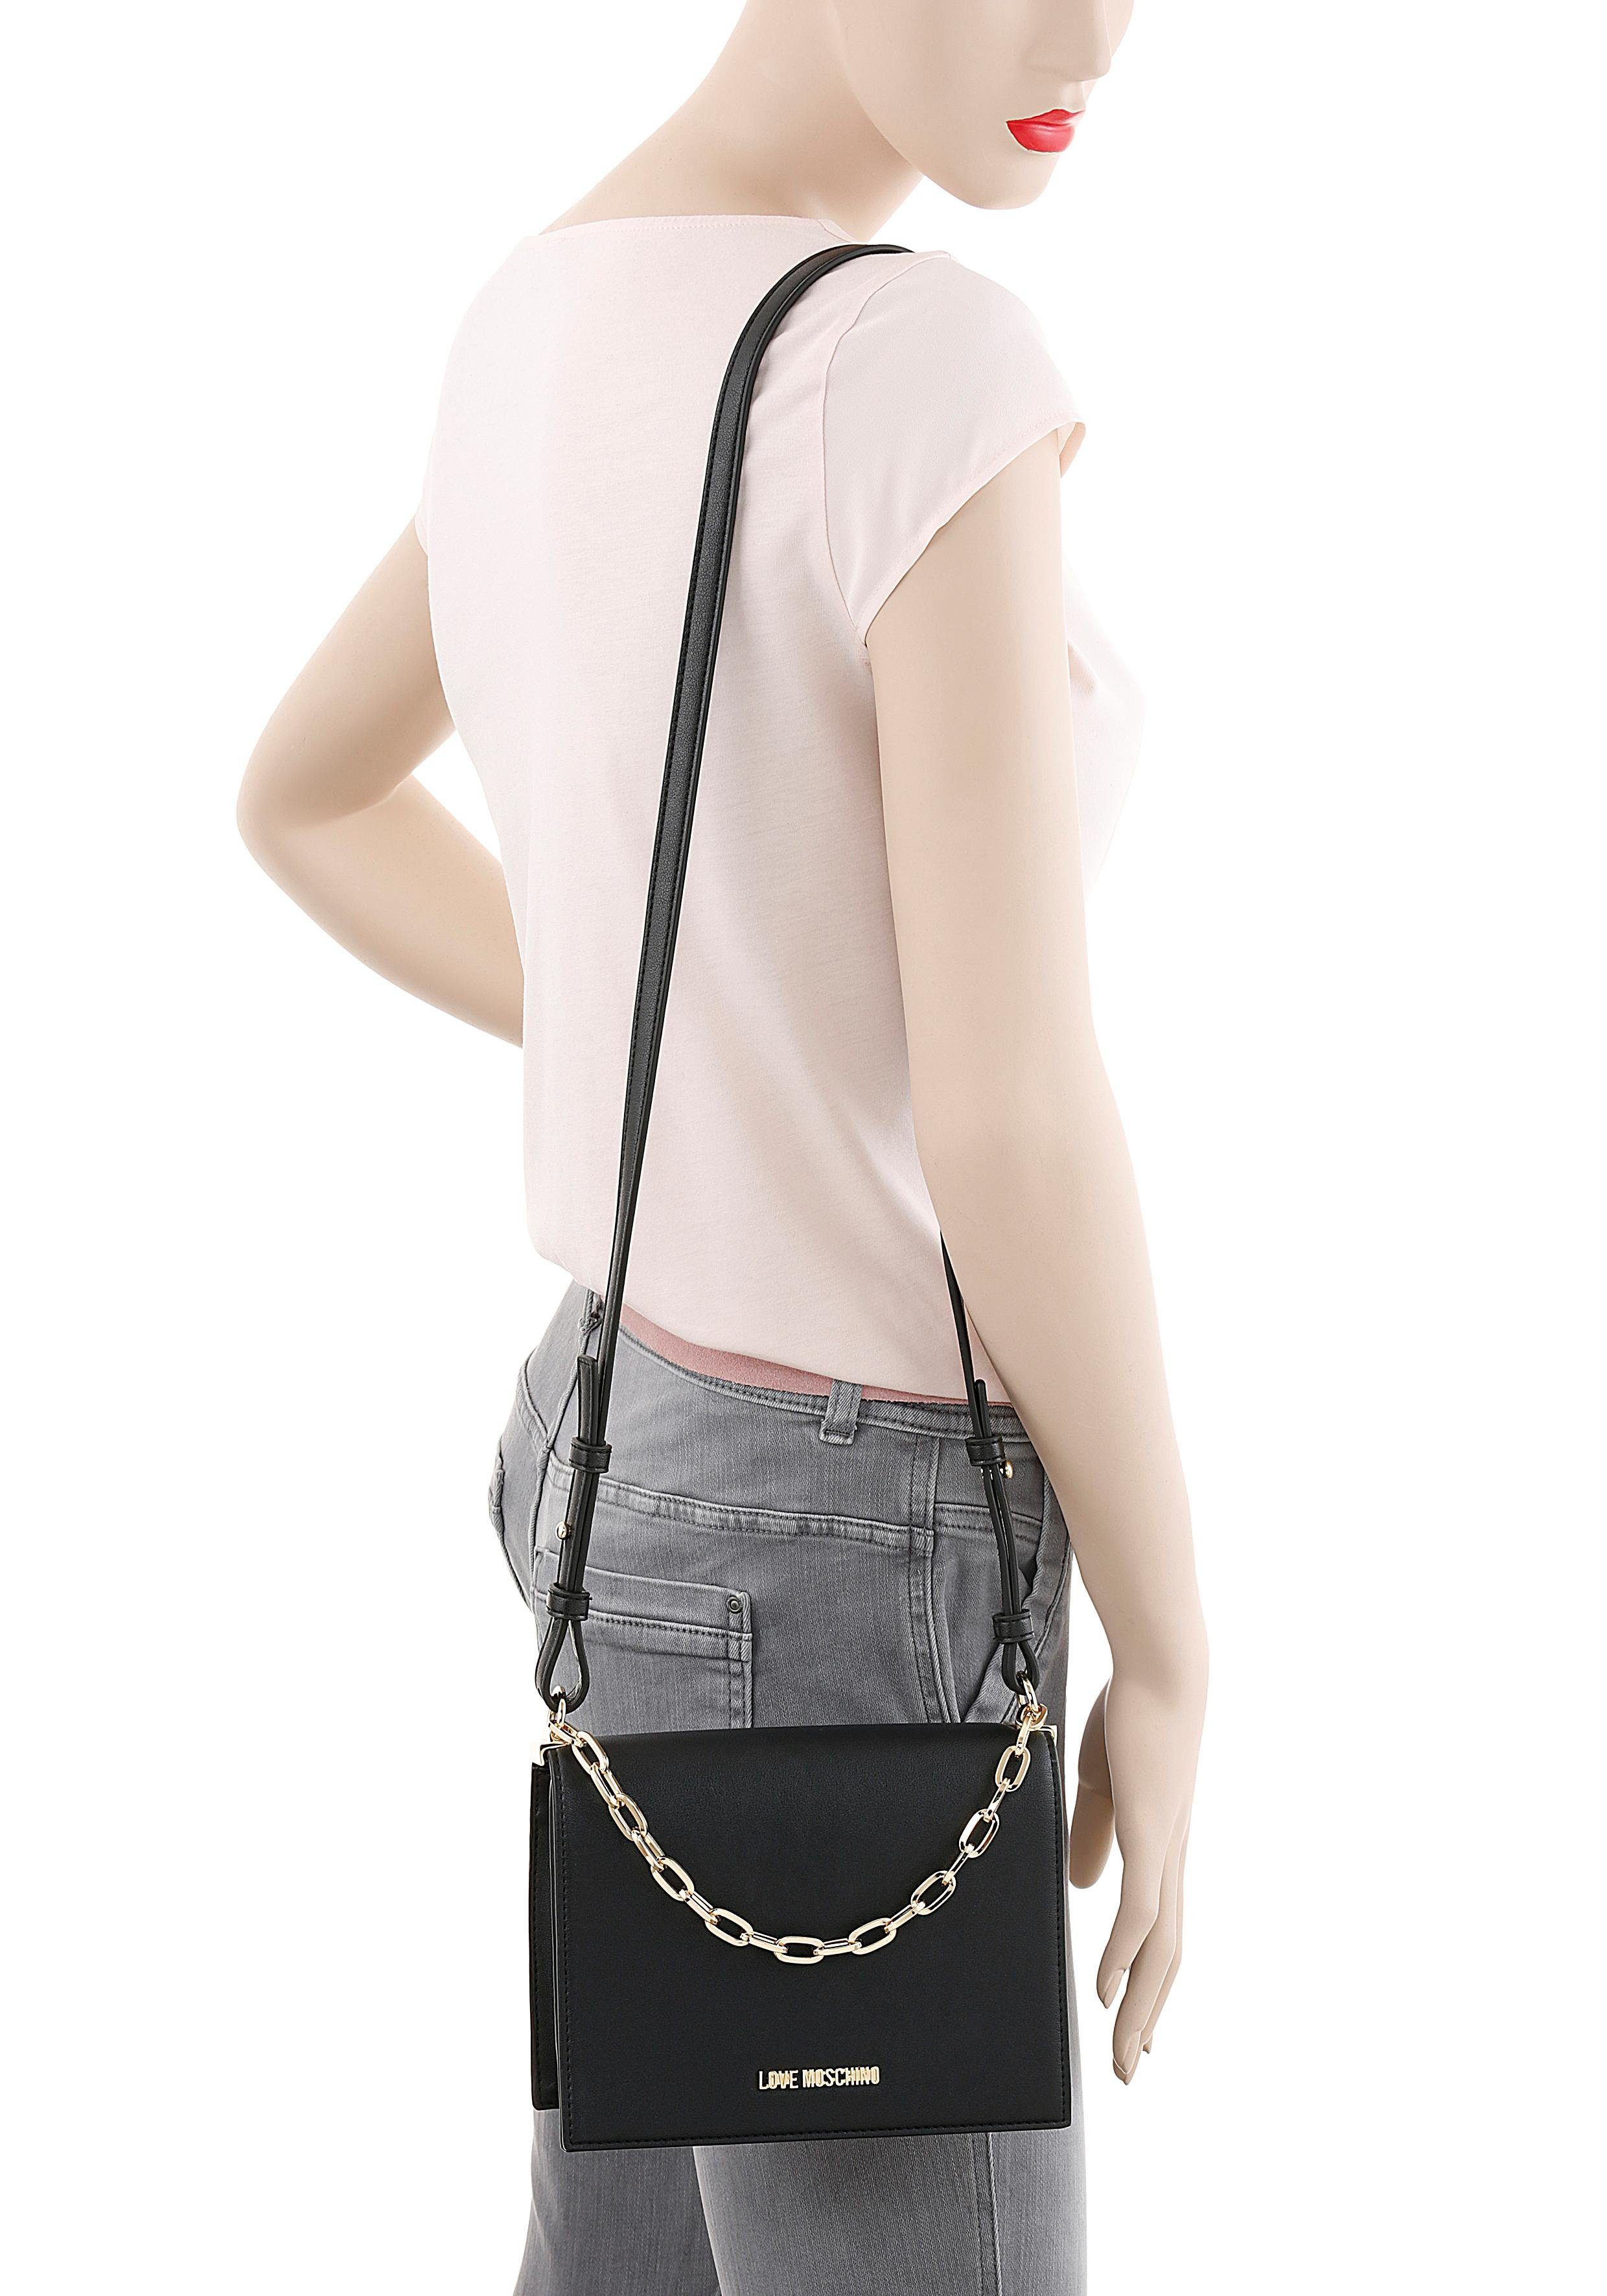 Zierkette Mit Love Moschino Bag Mini wIxqBFxP7